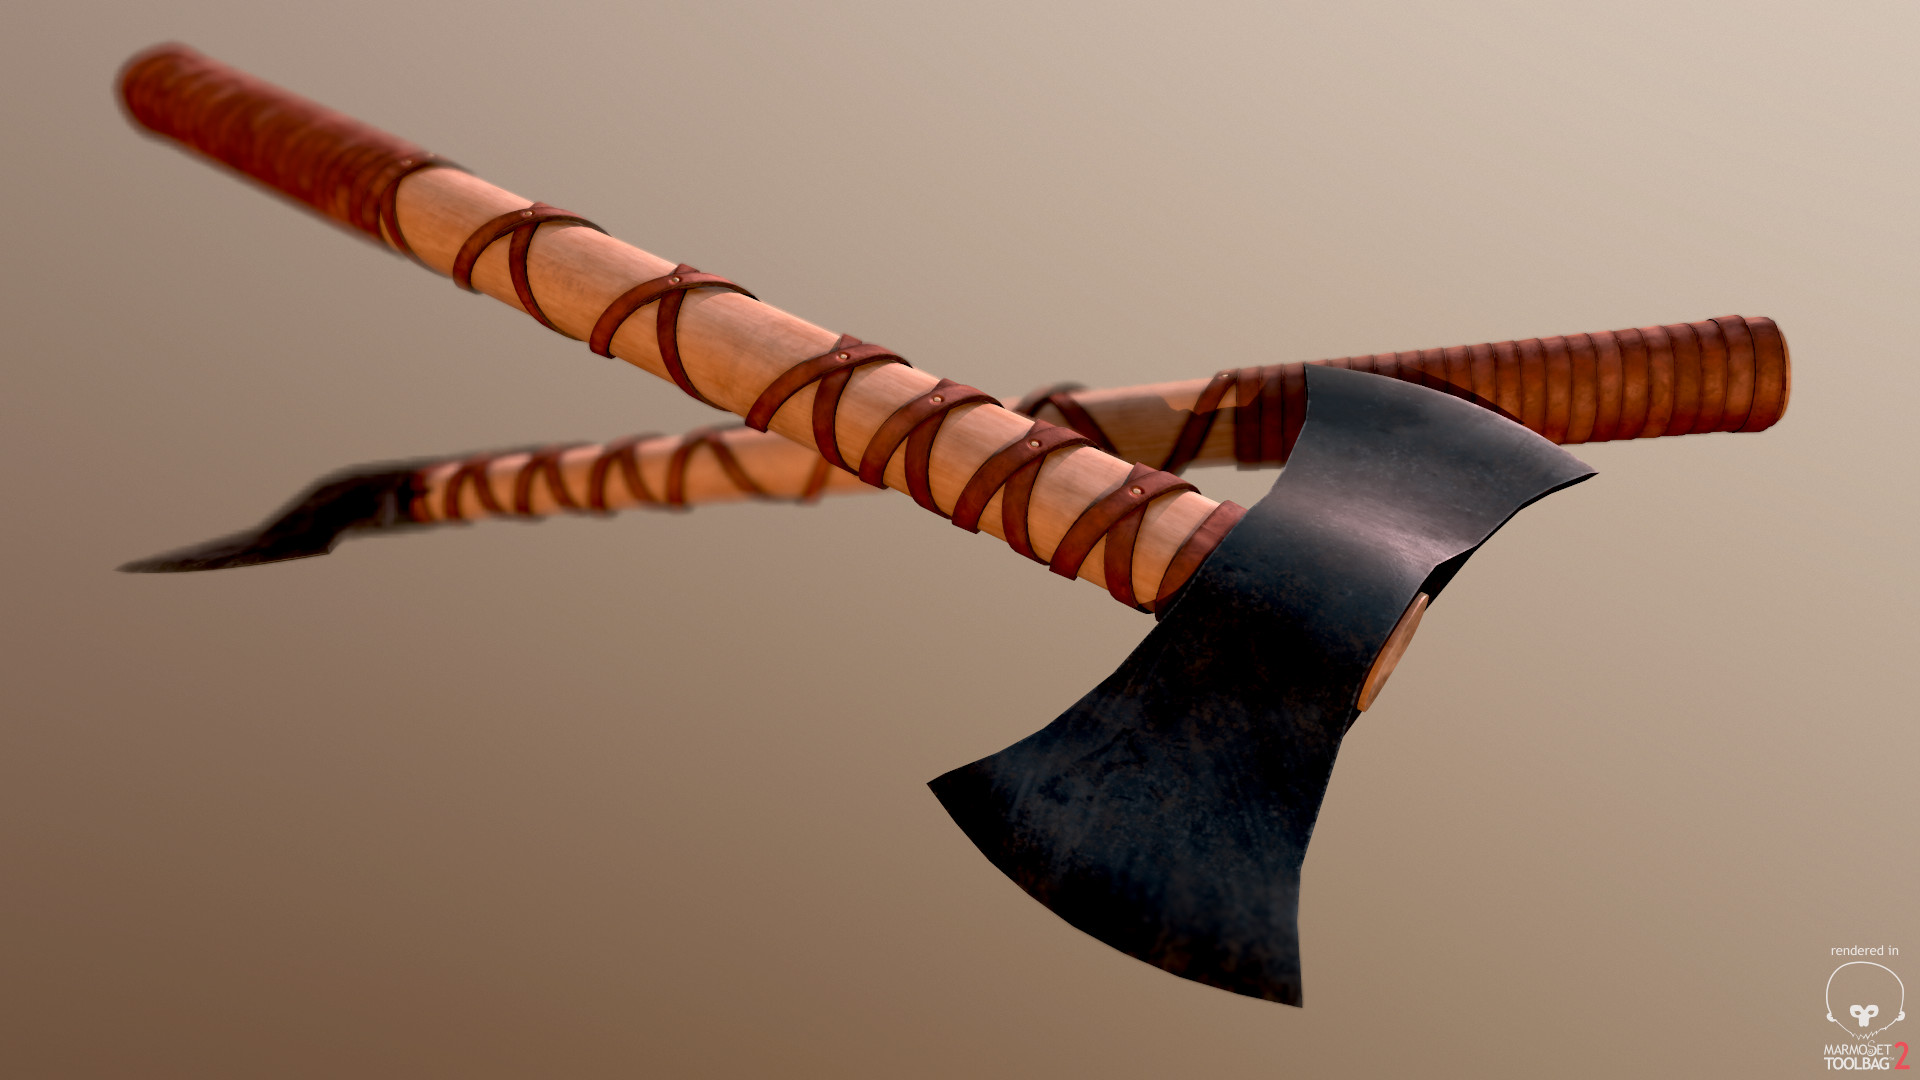 Bela csampai two headed viking axe preview mt 02